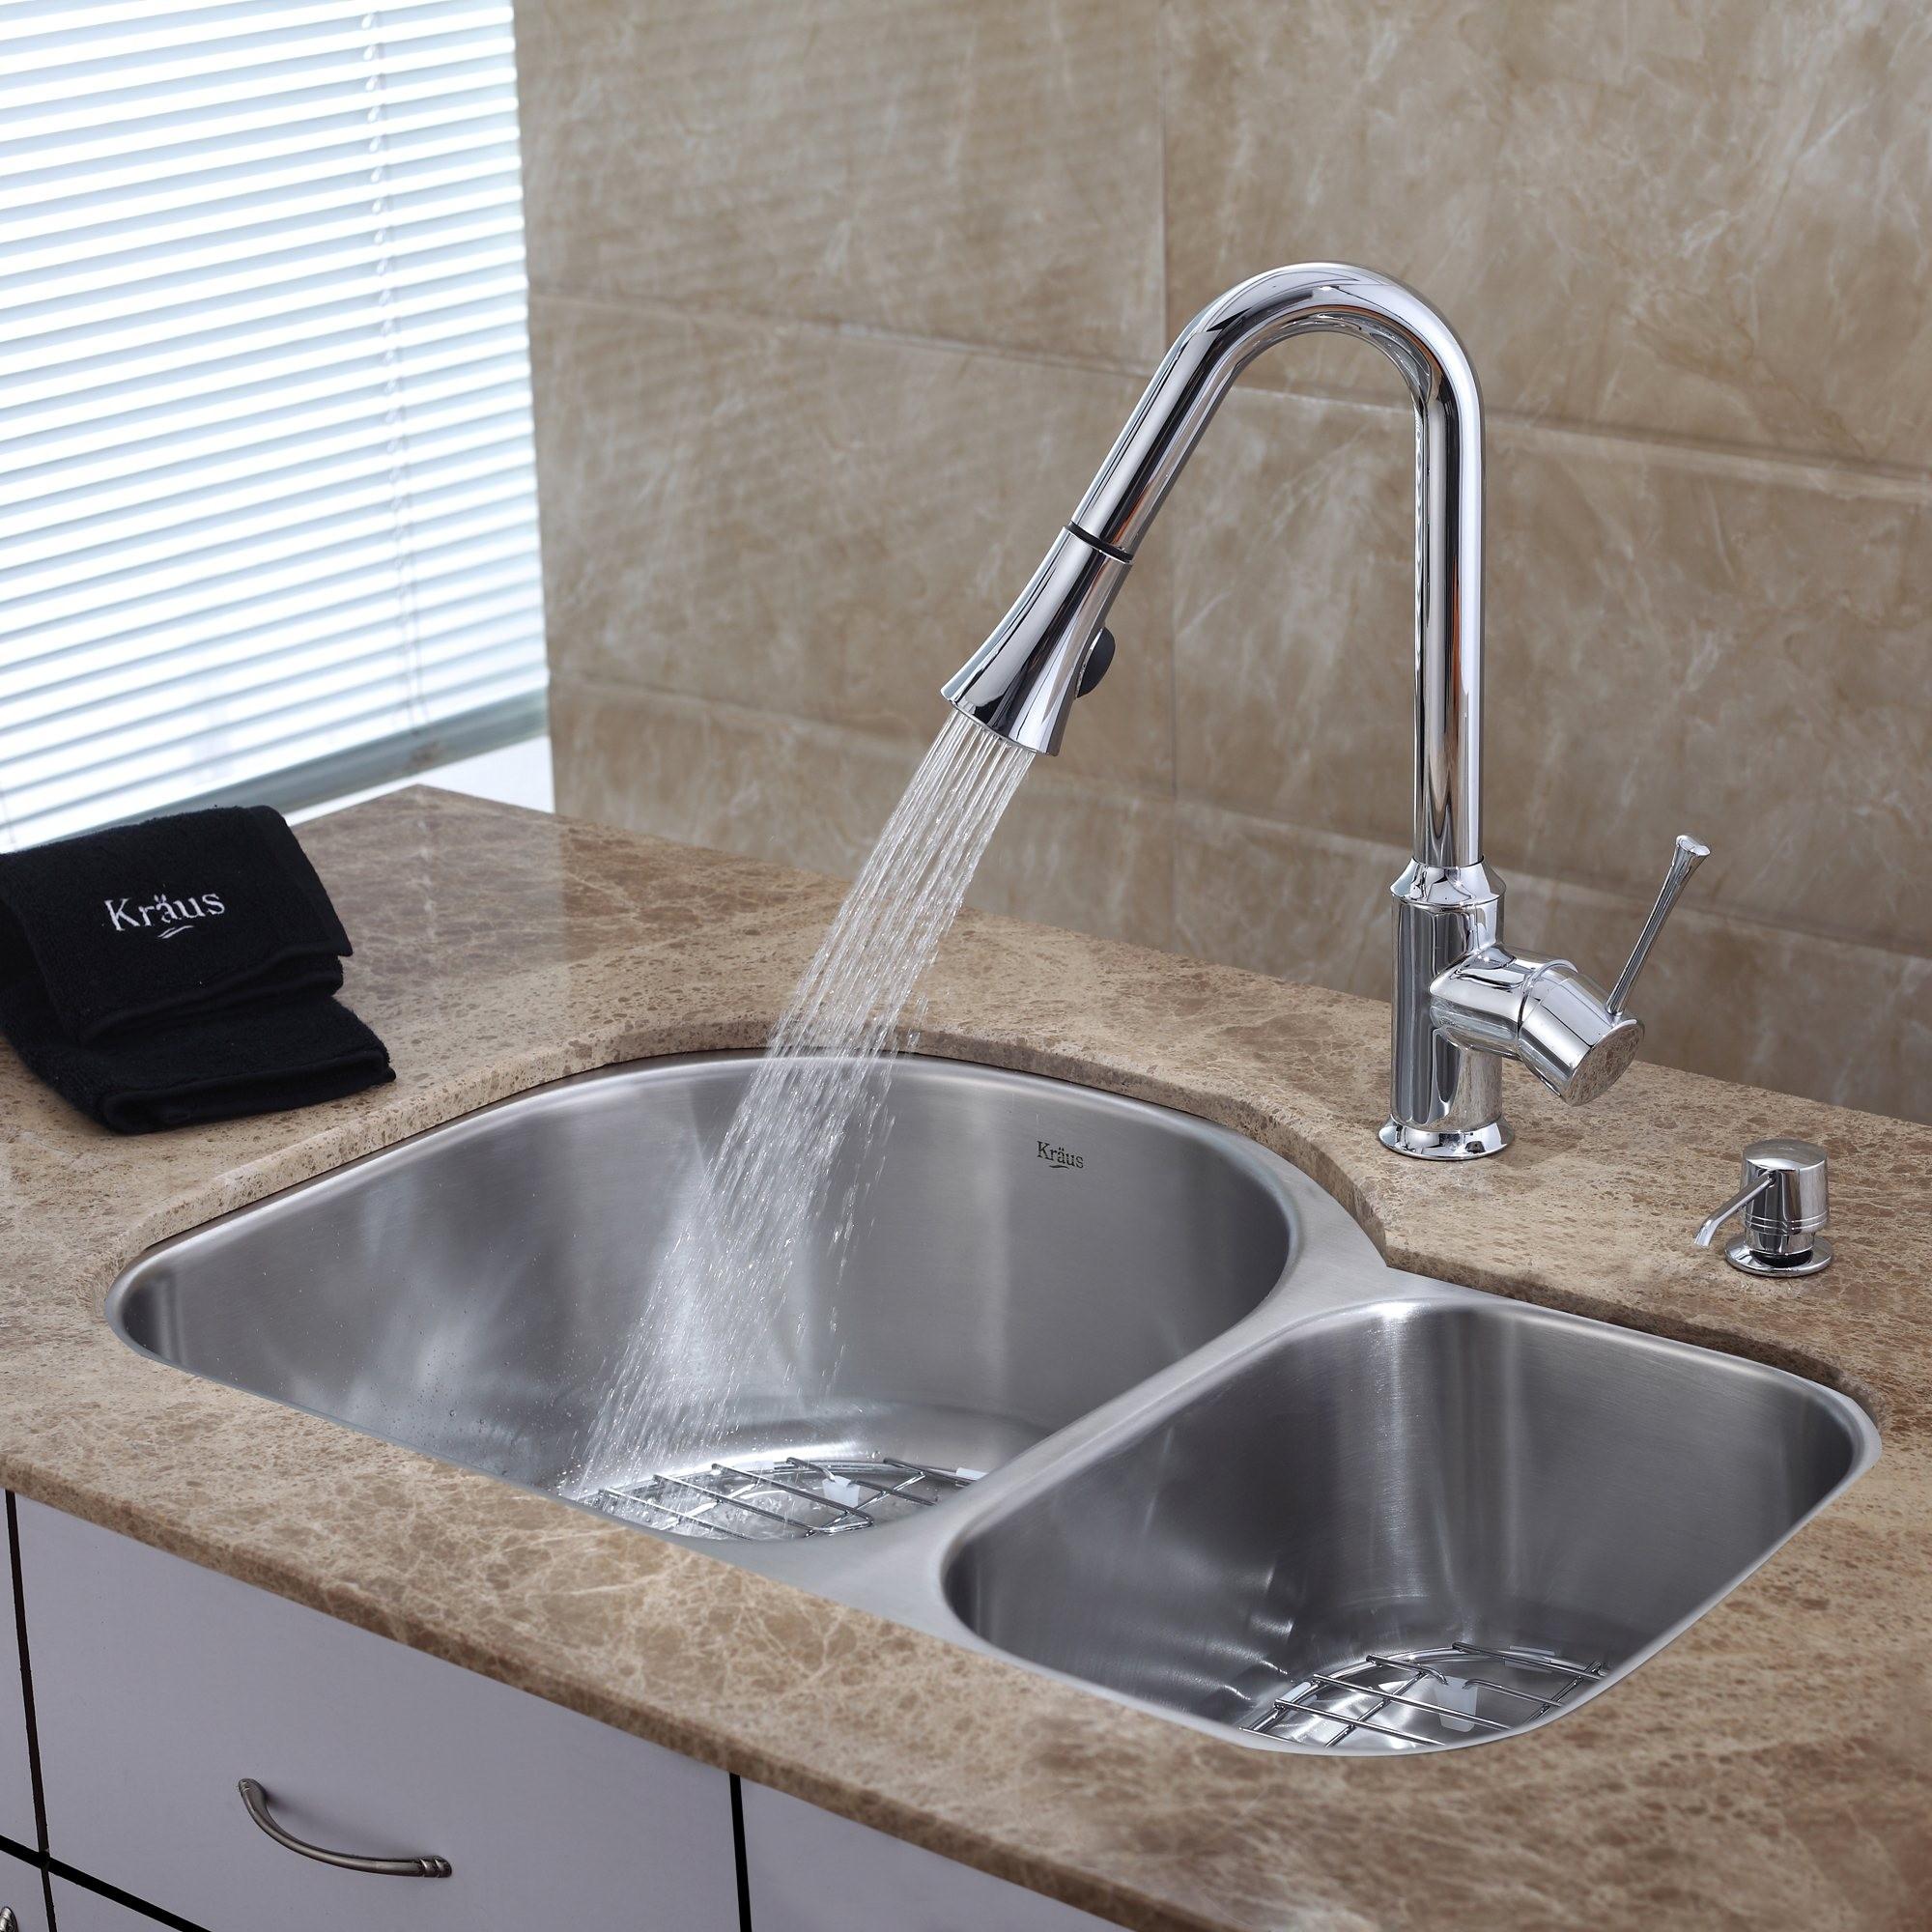 Ideas, undermount kitchen sink and faucet combo undermount kitchen sink and faucet combo stainless steel kitchen sink combination kraususa 2000 x 2000 2  .